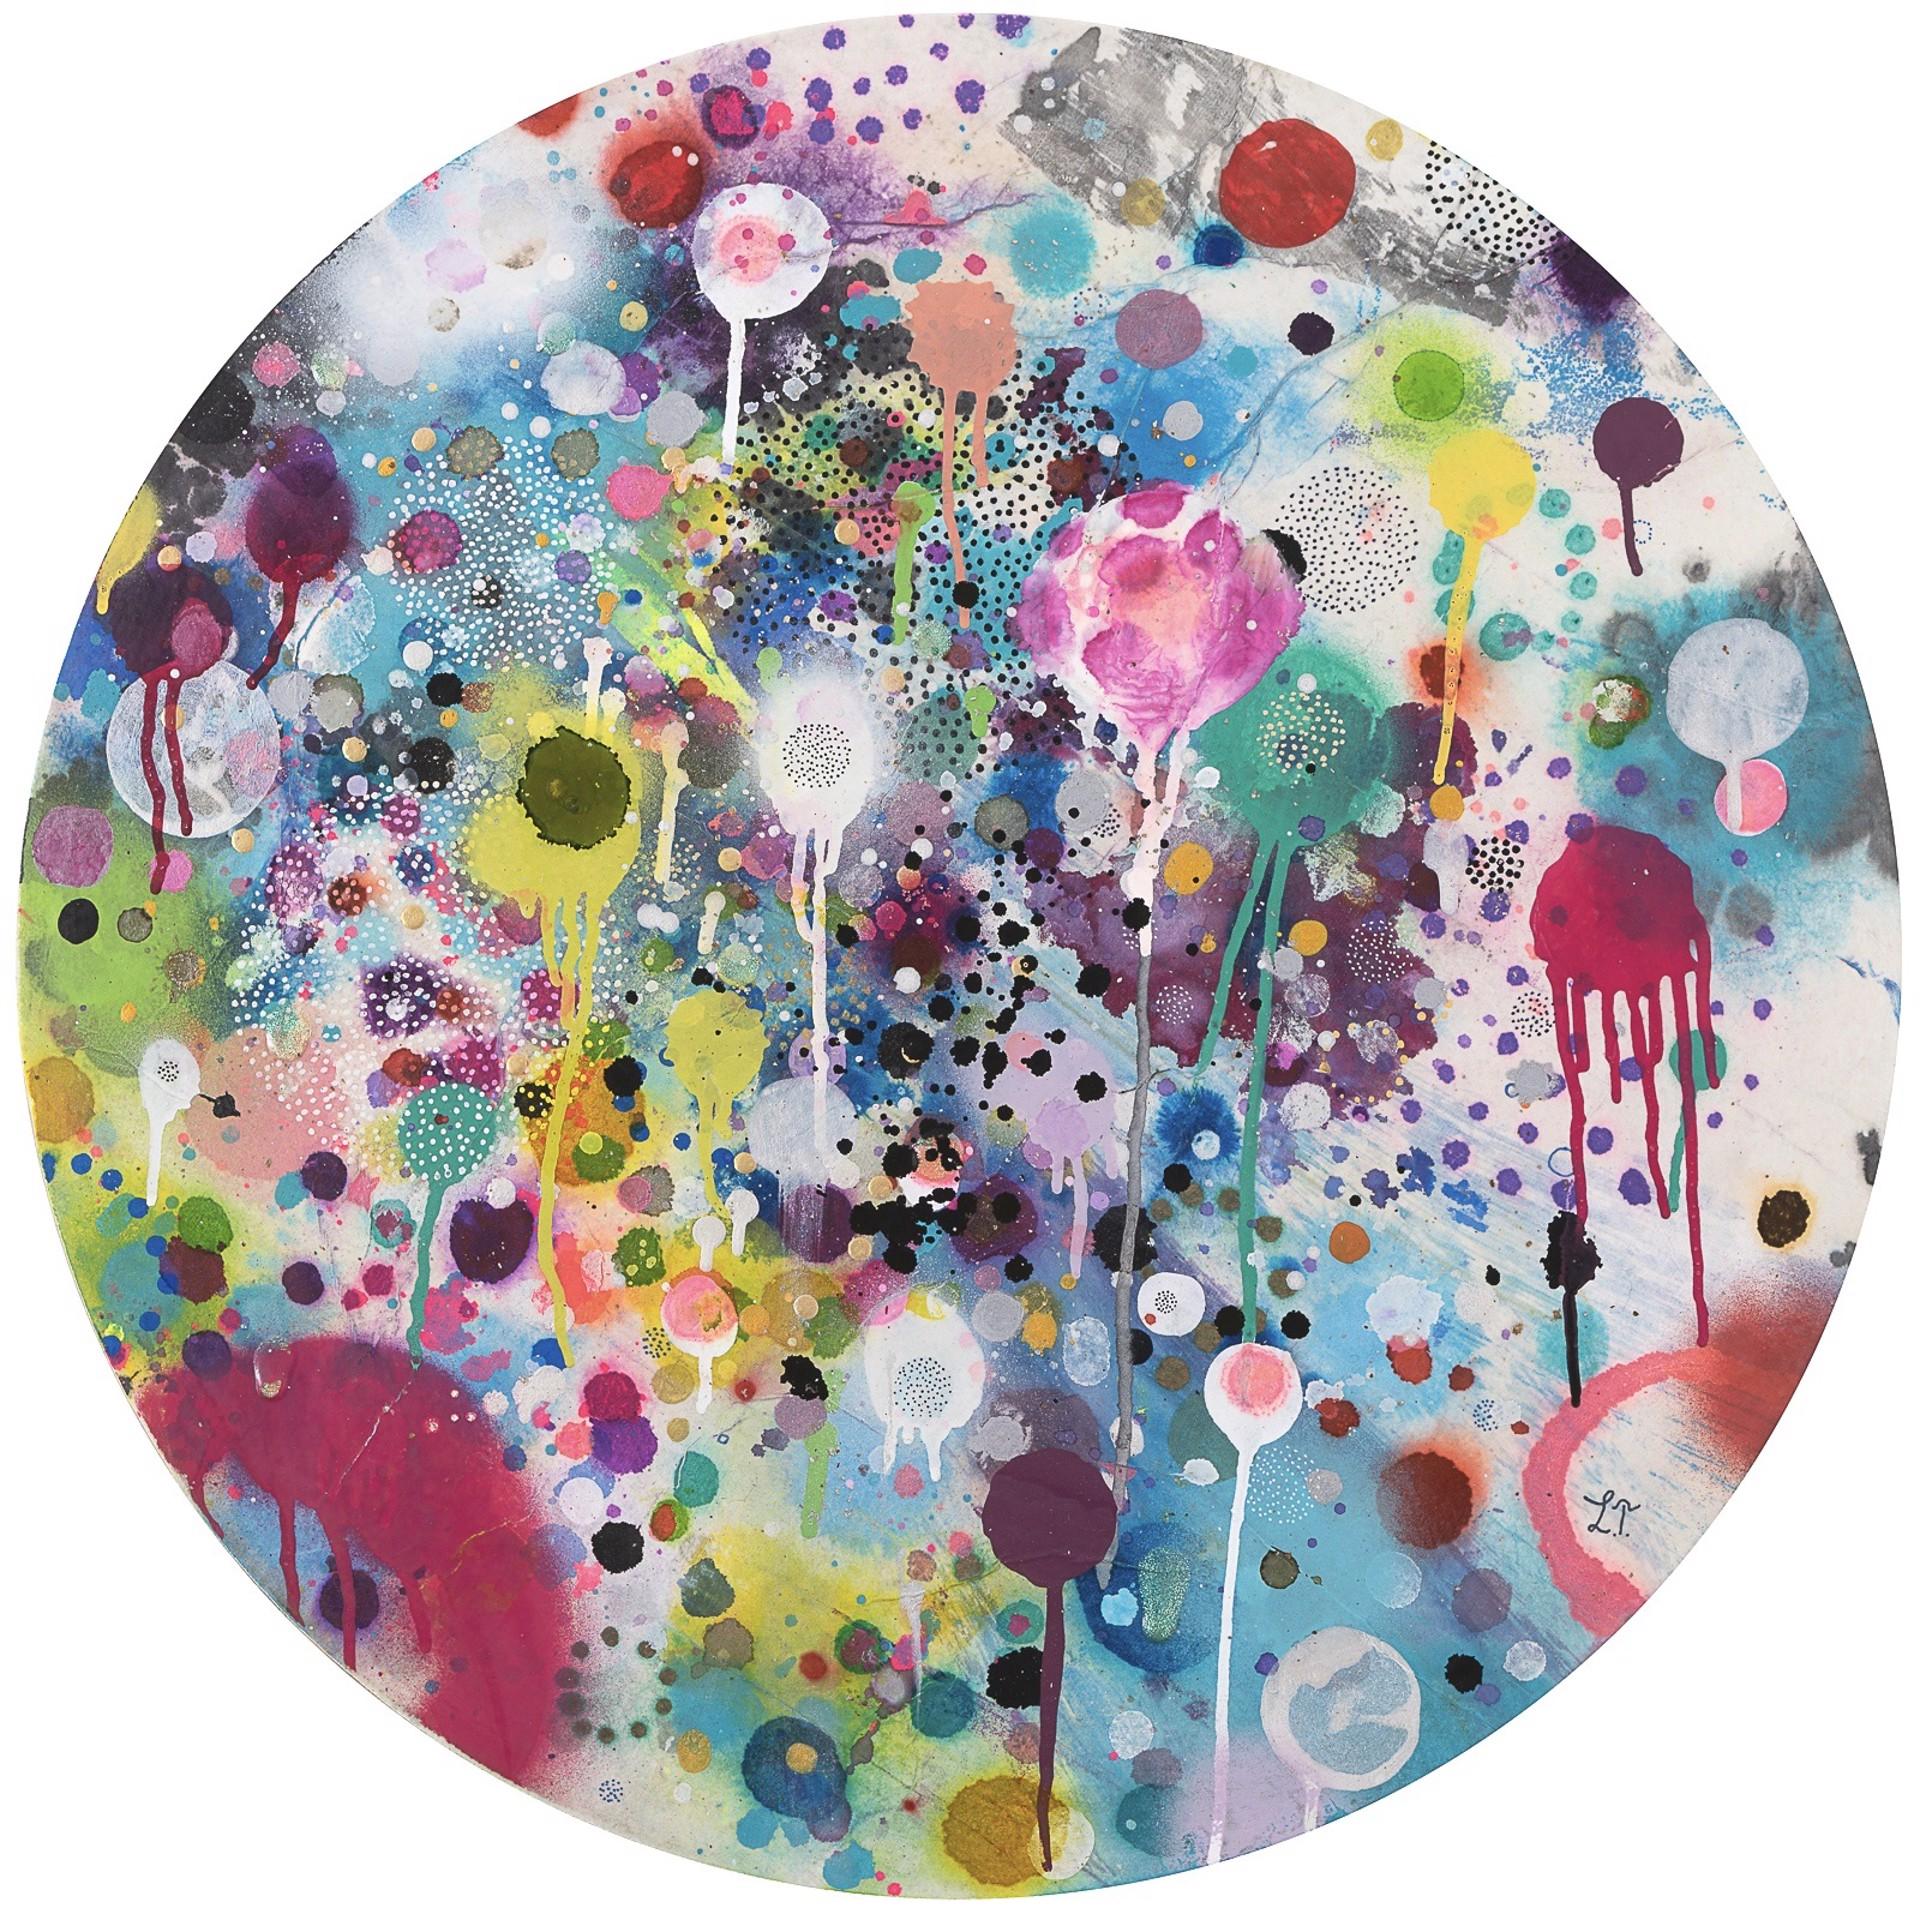 Cosmic Circle 4 by Liz Tran